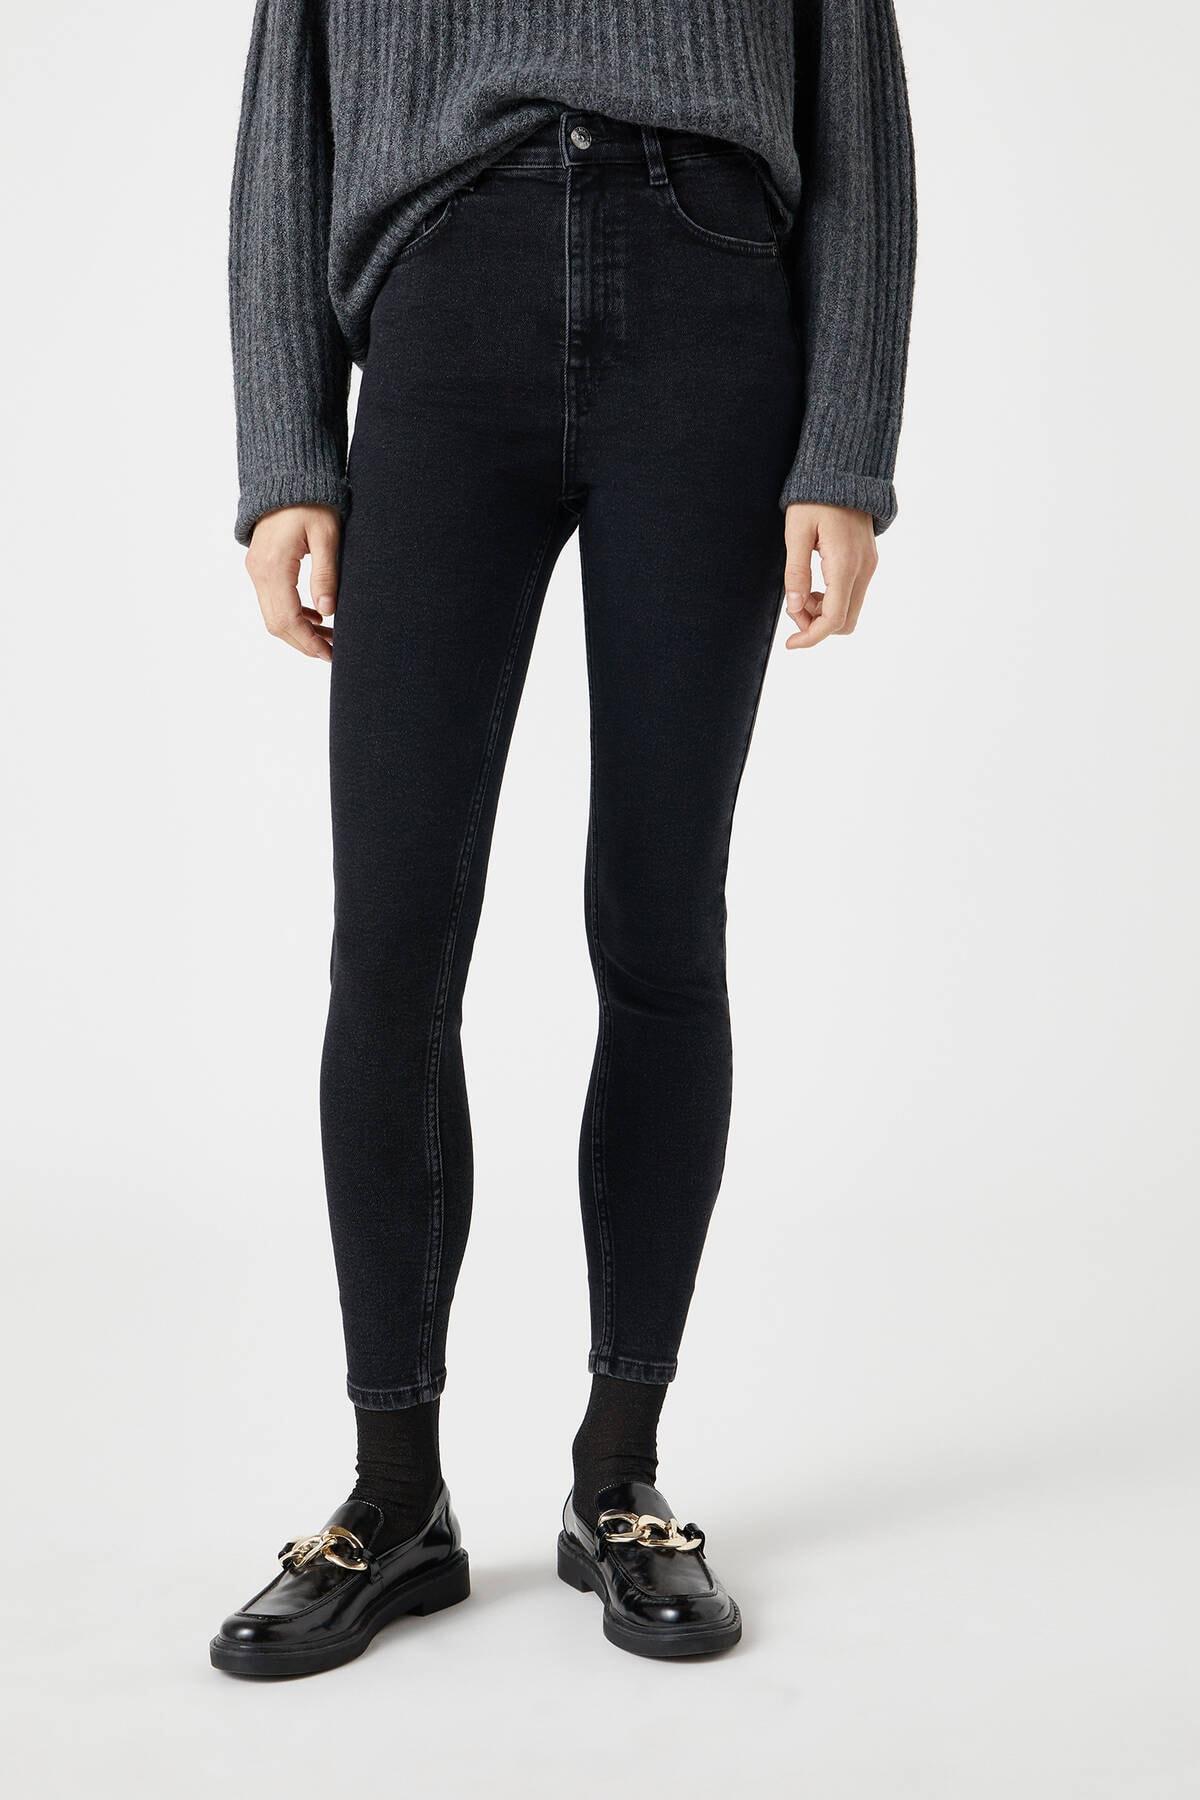 Pull & Bear Kadın Siyah Yüksek Bel Skinny Fit Jean 09683340 1